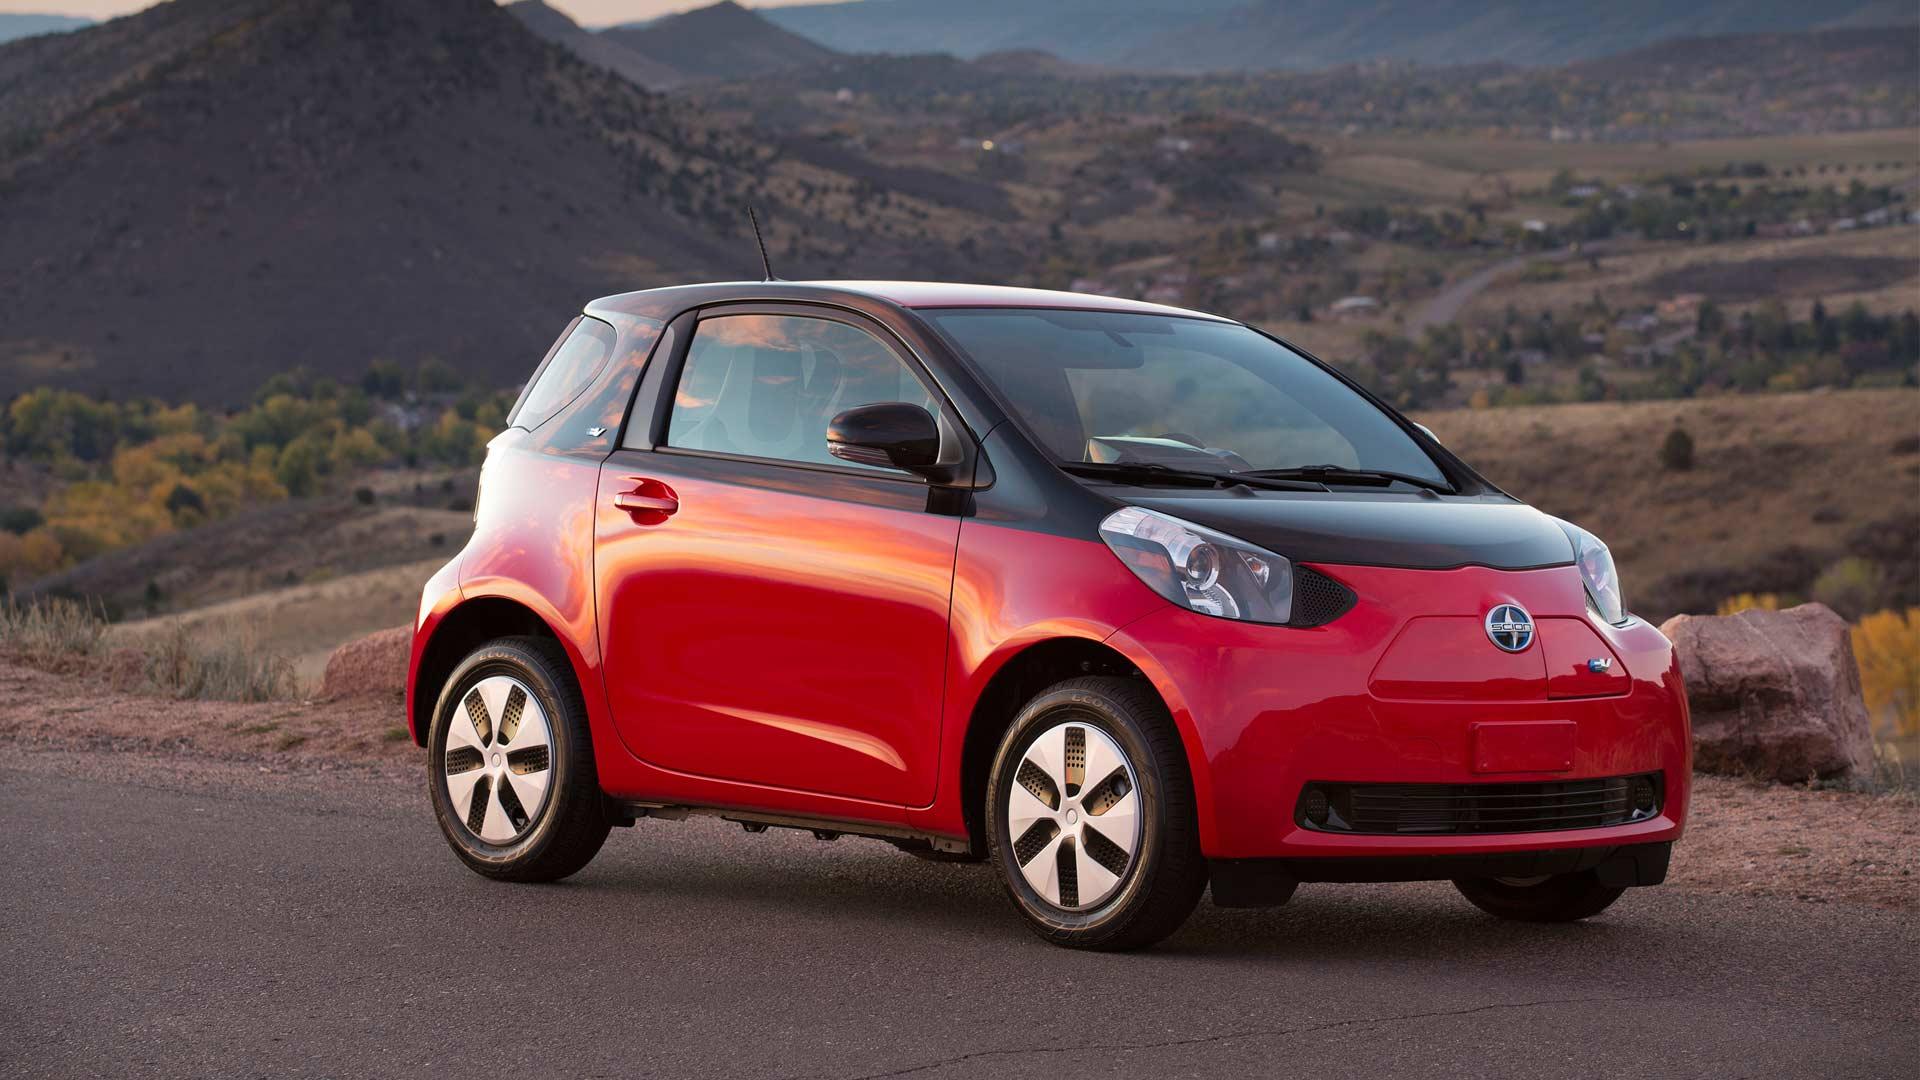 2013-Toyota-Scion-iQ-EV